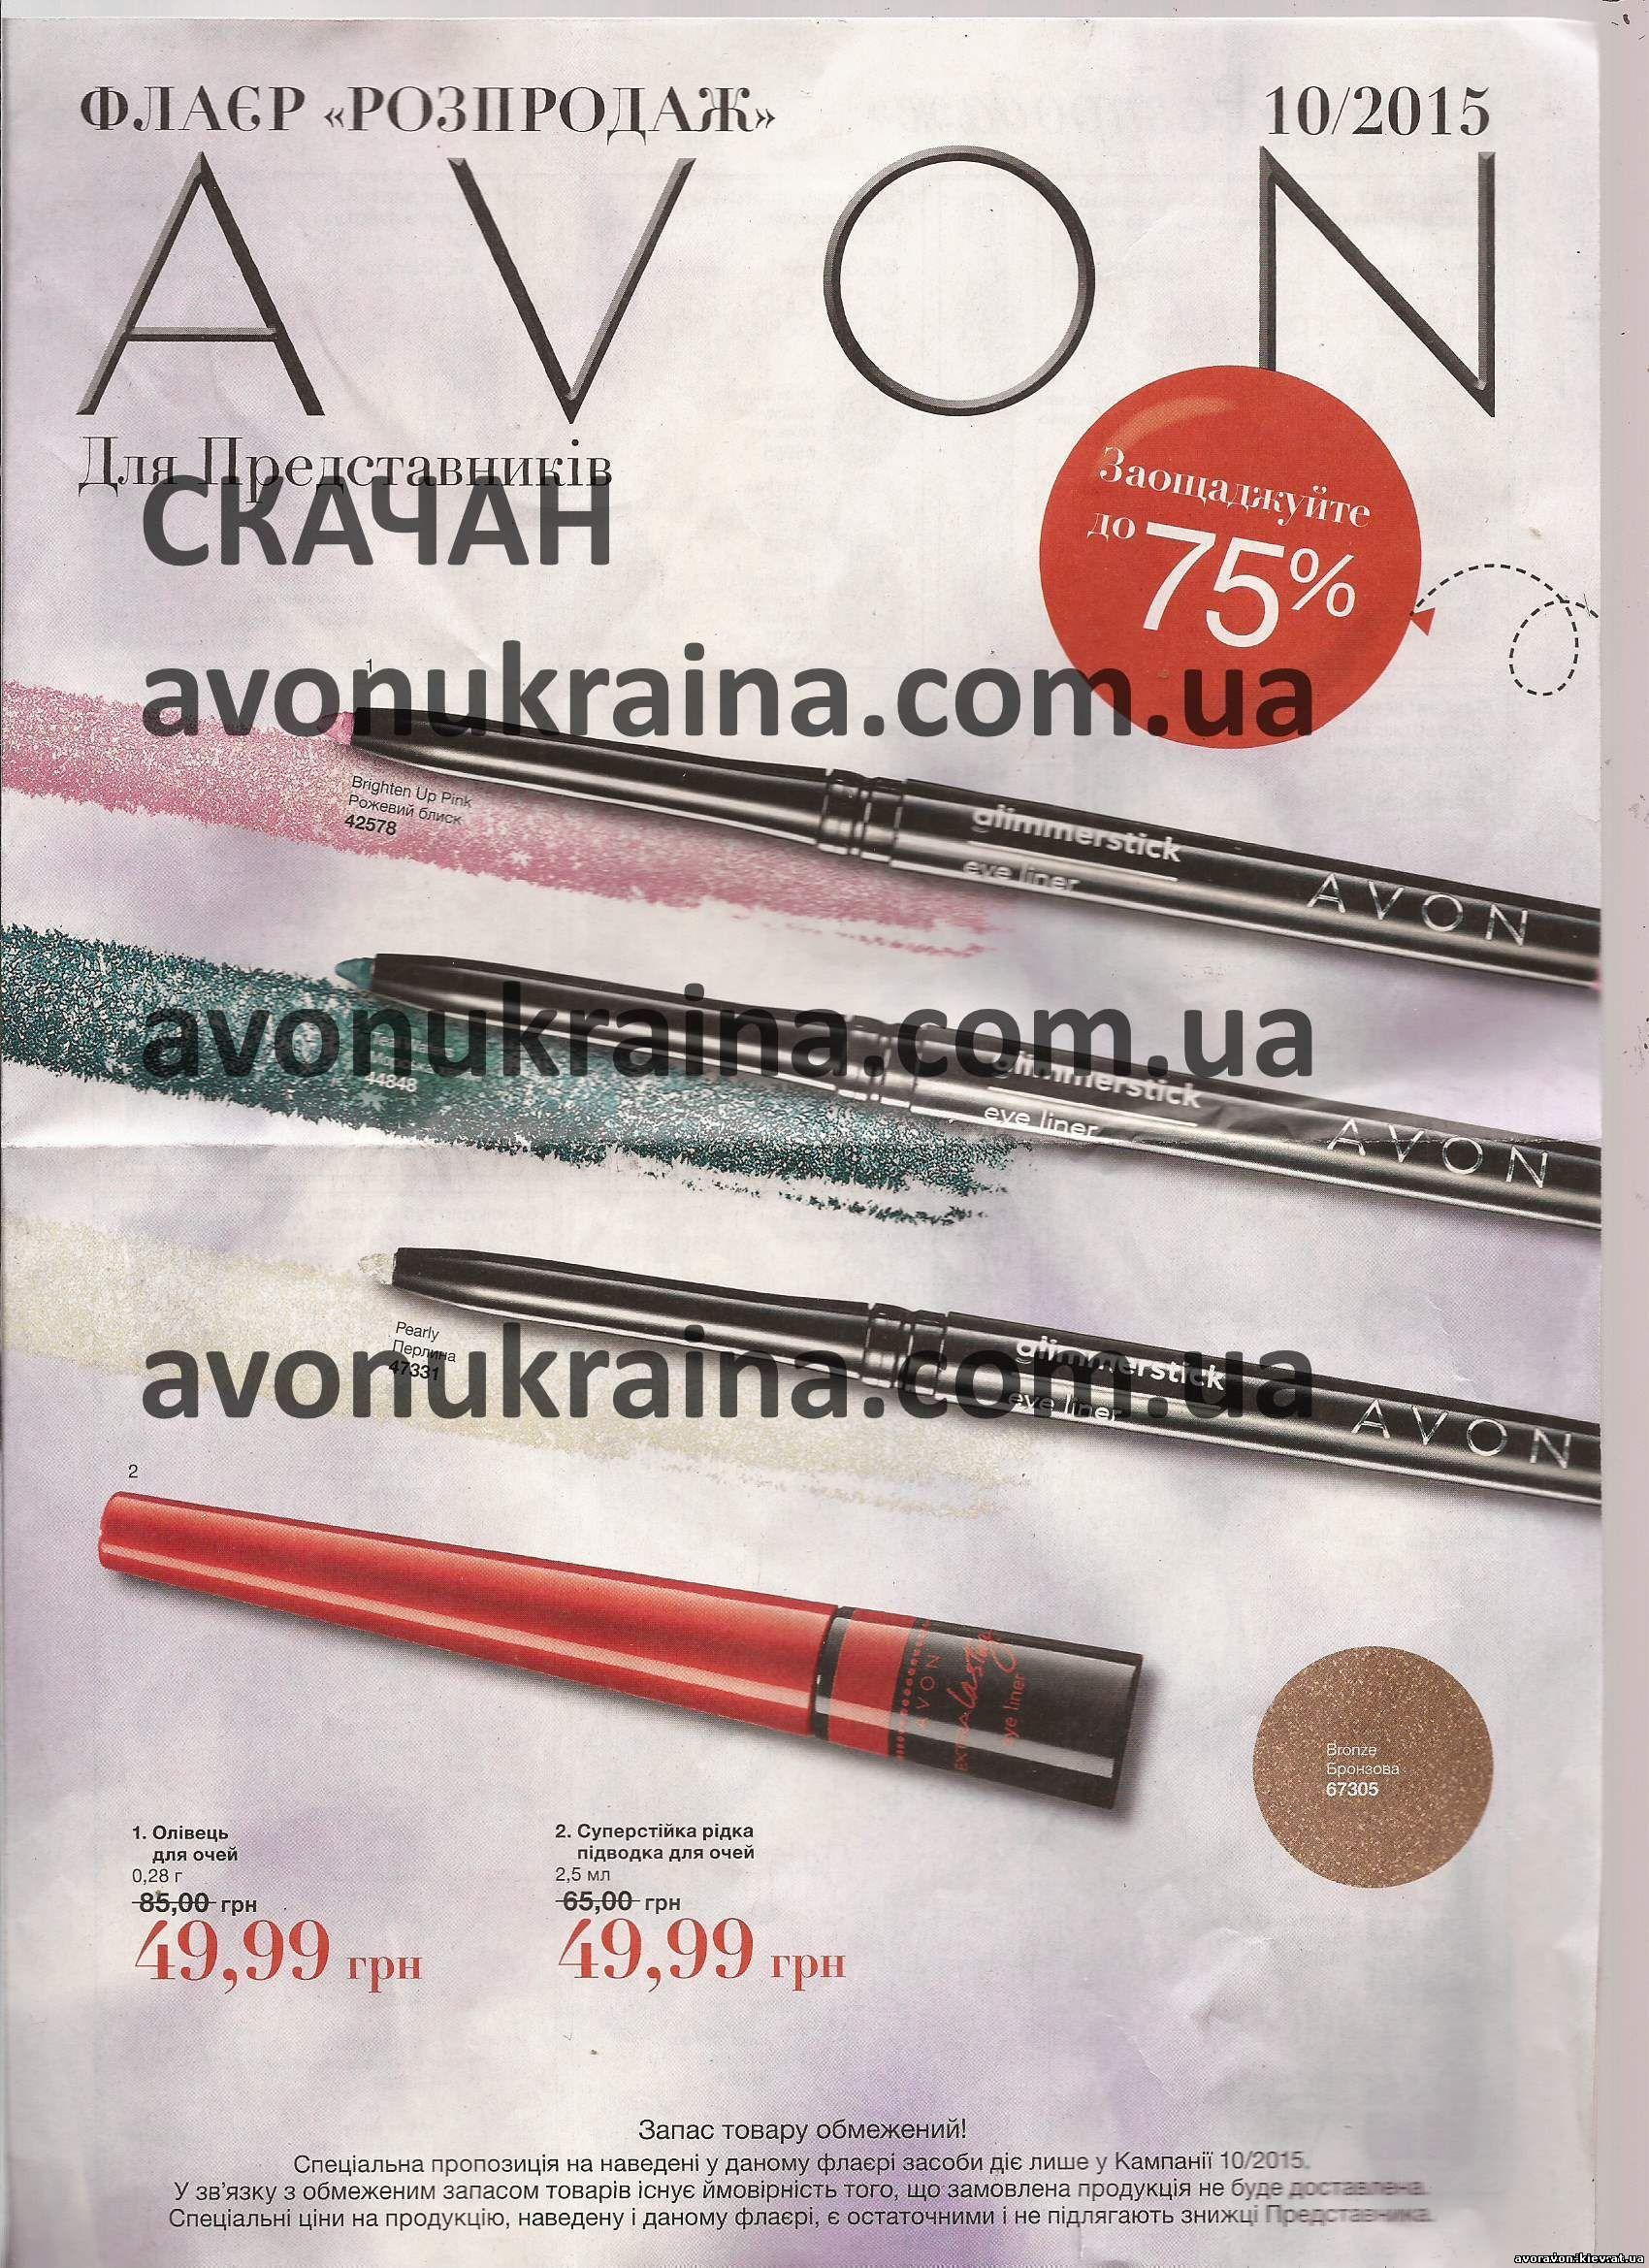 эйвон каталог 10 2013 смотреть онлайн распродажа: